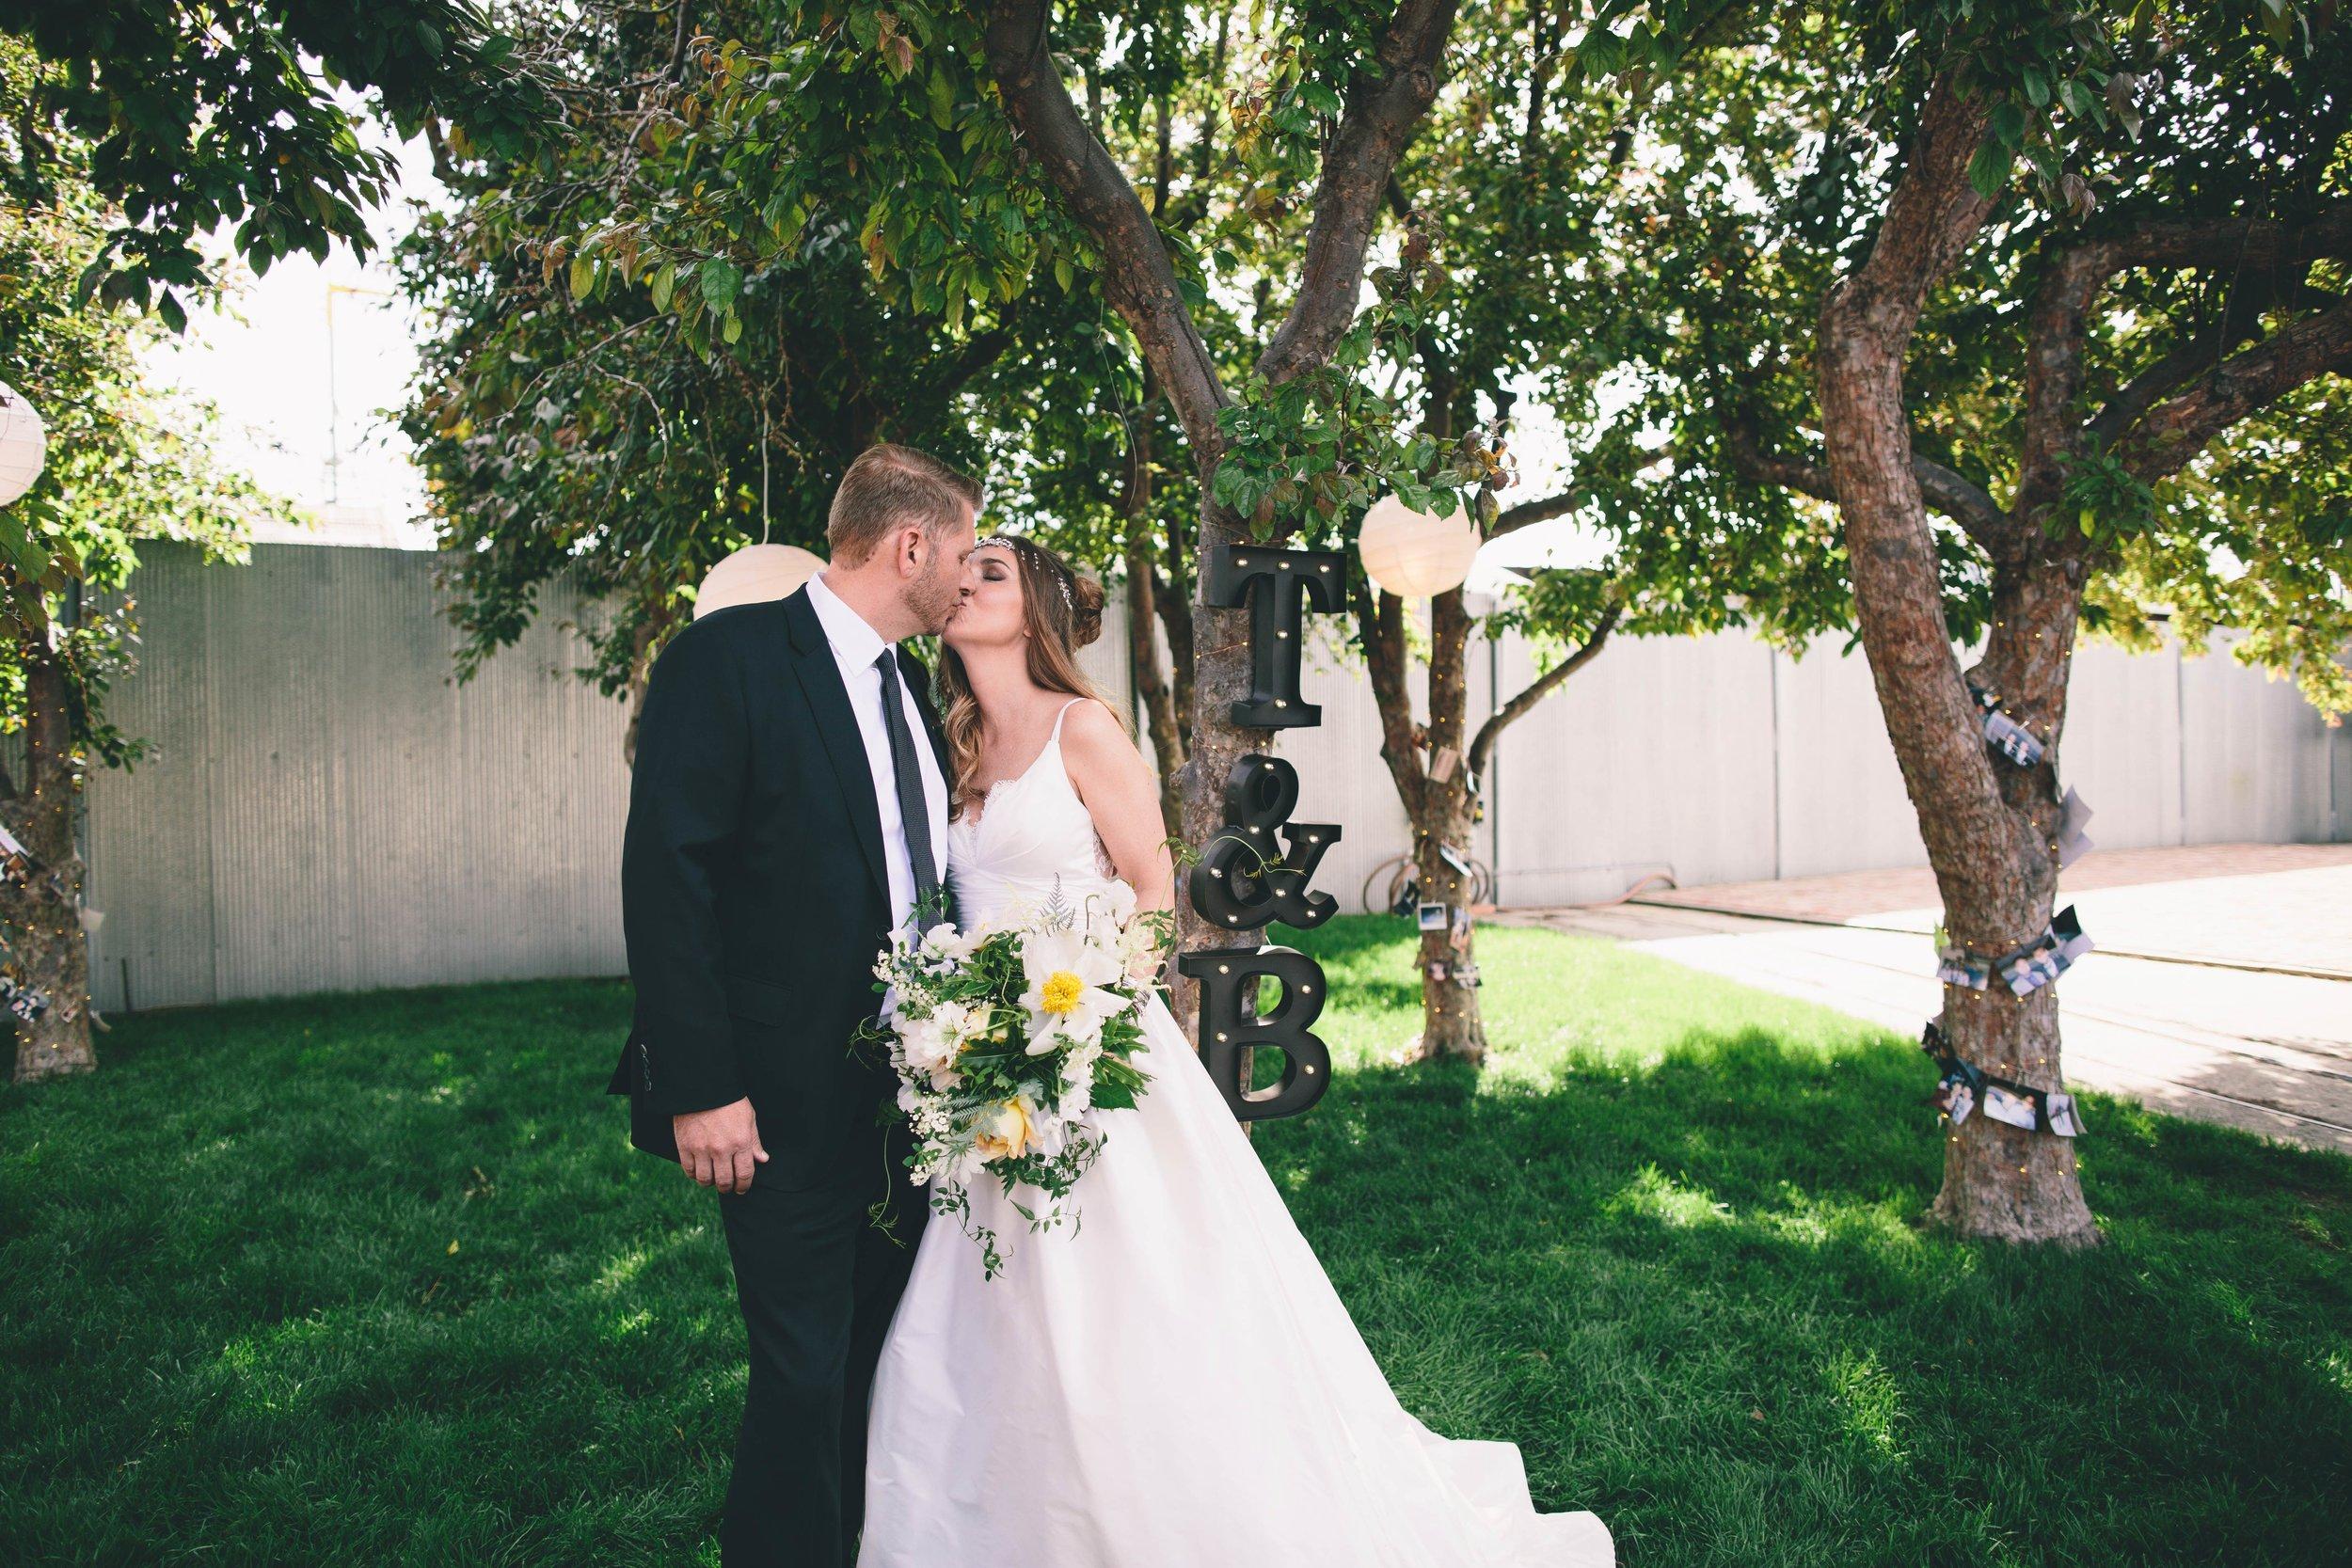 MP_16.05.21_Tina-&-Brad-Wedding-no-grain-9492.jpg